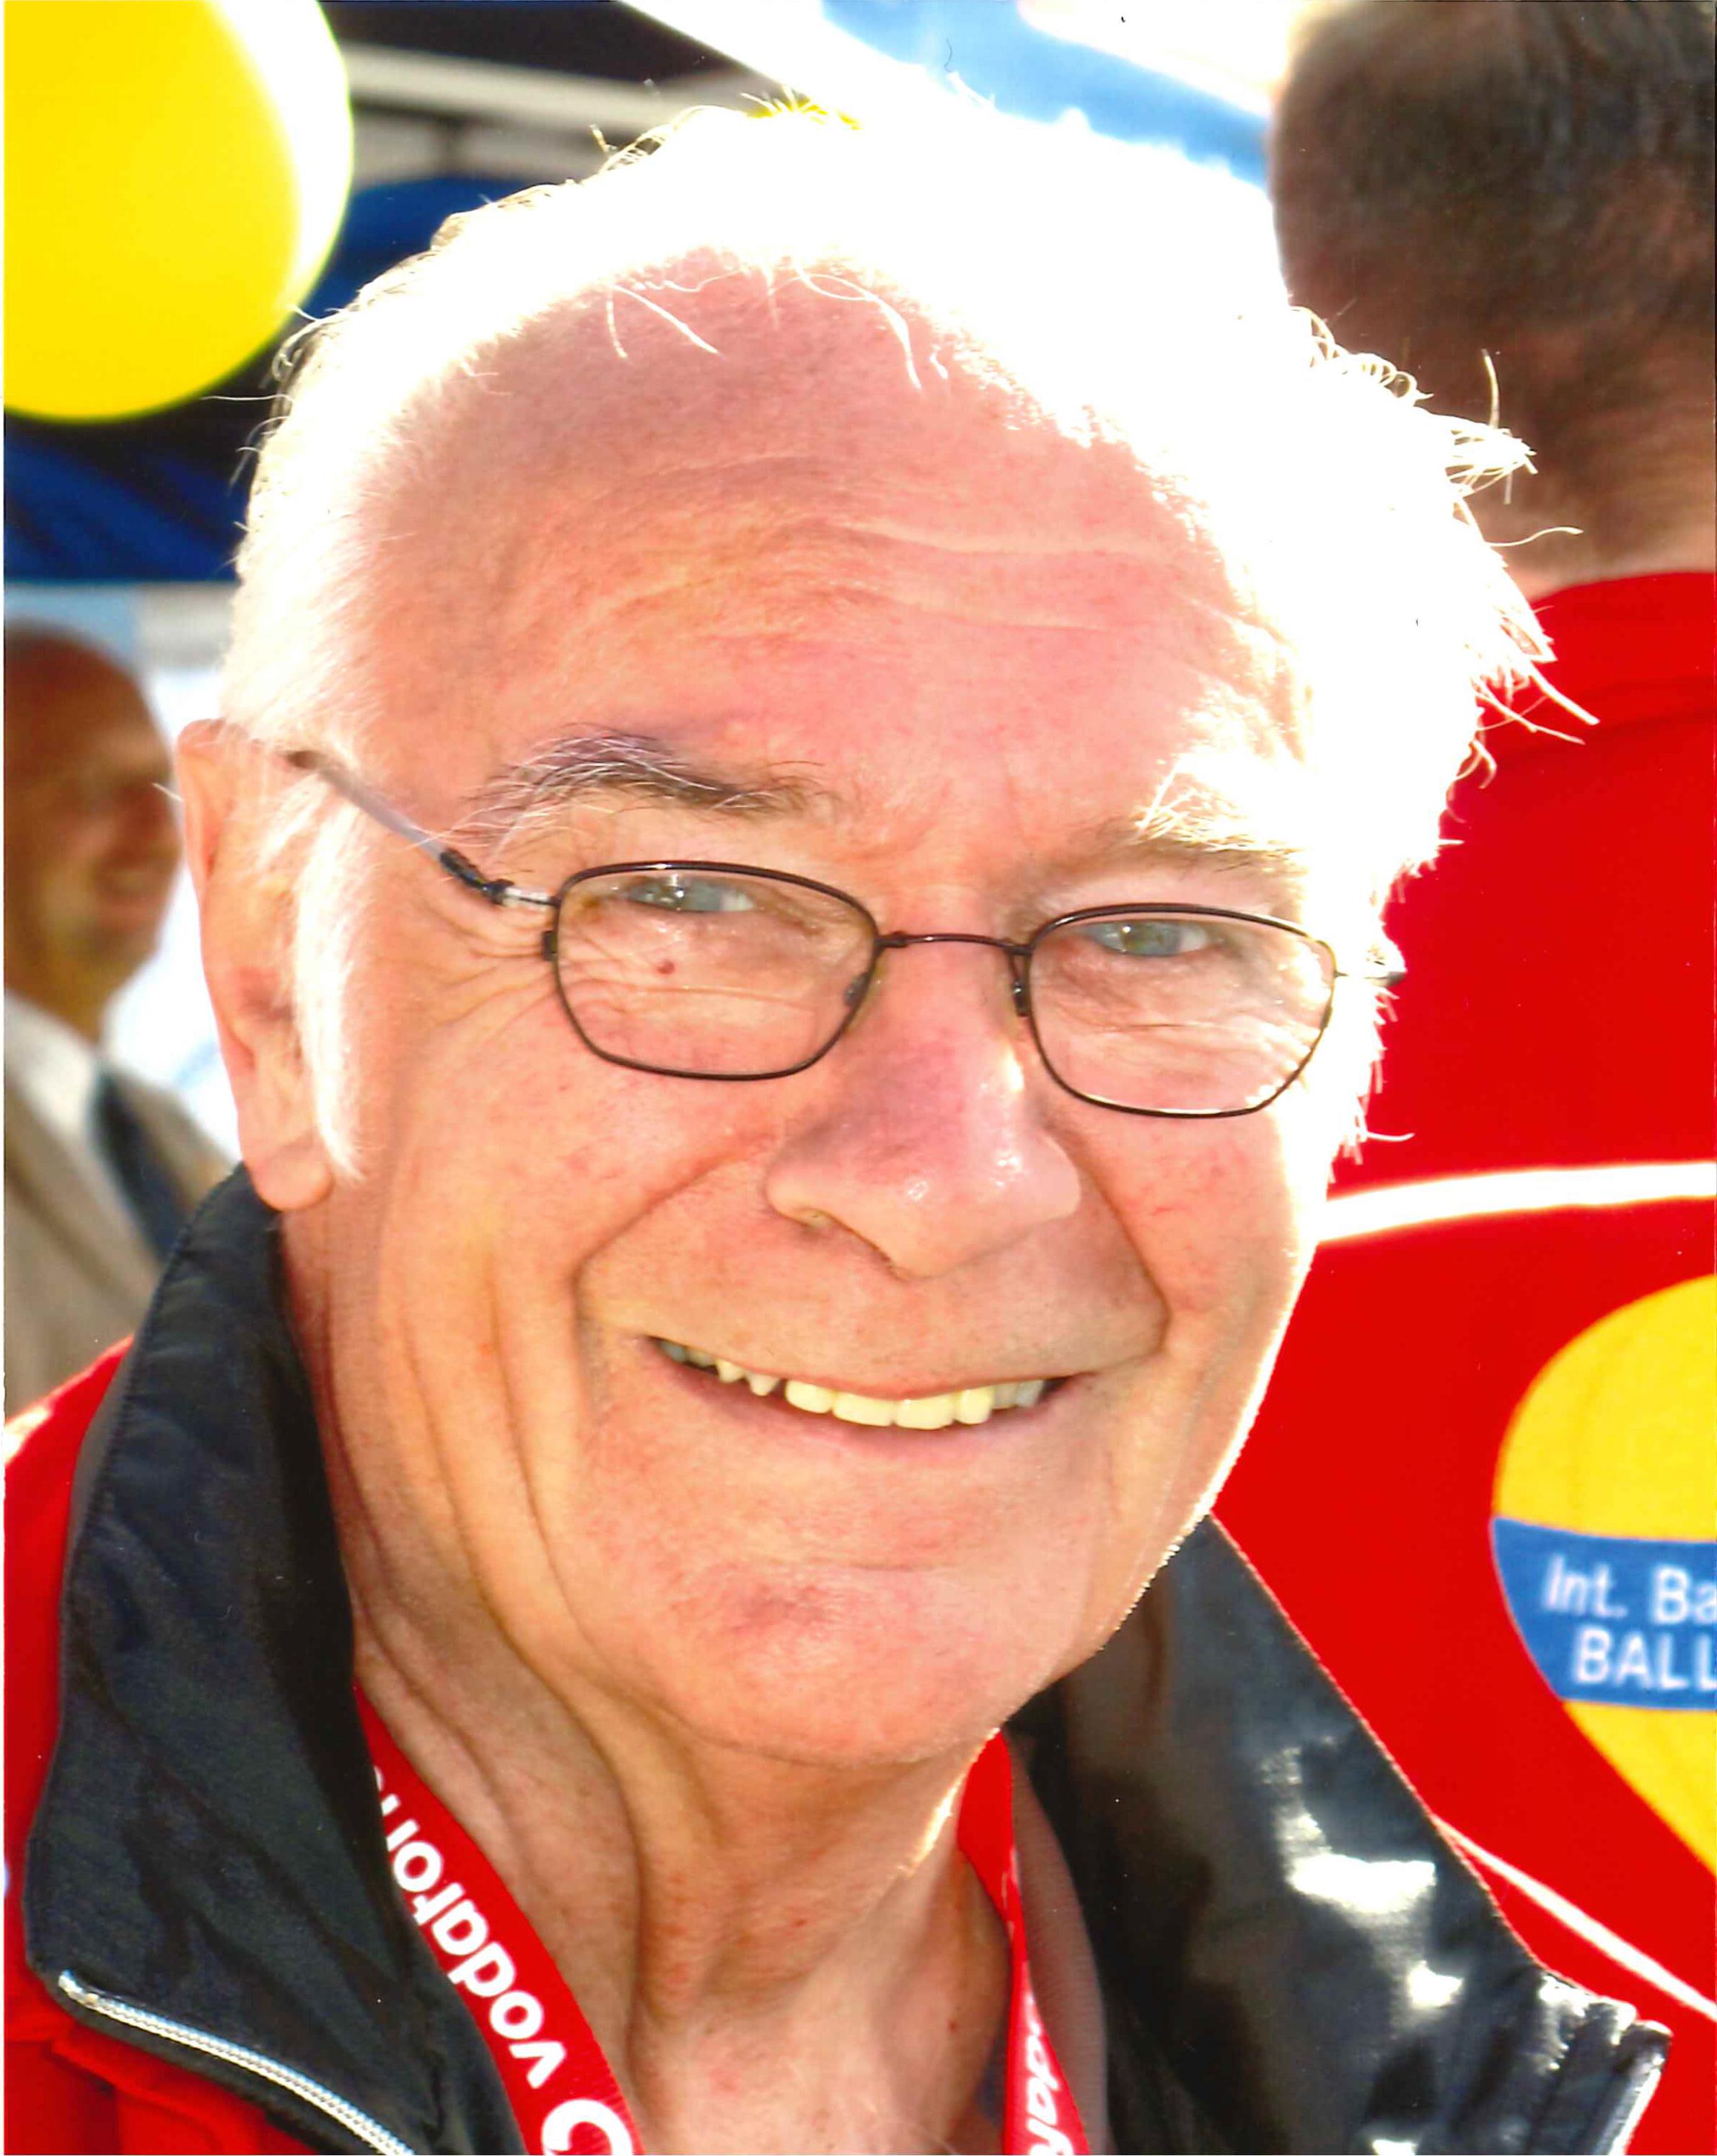 Guido Rebholz